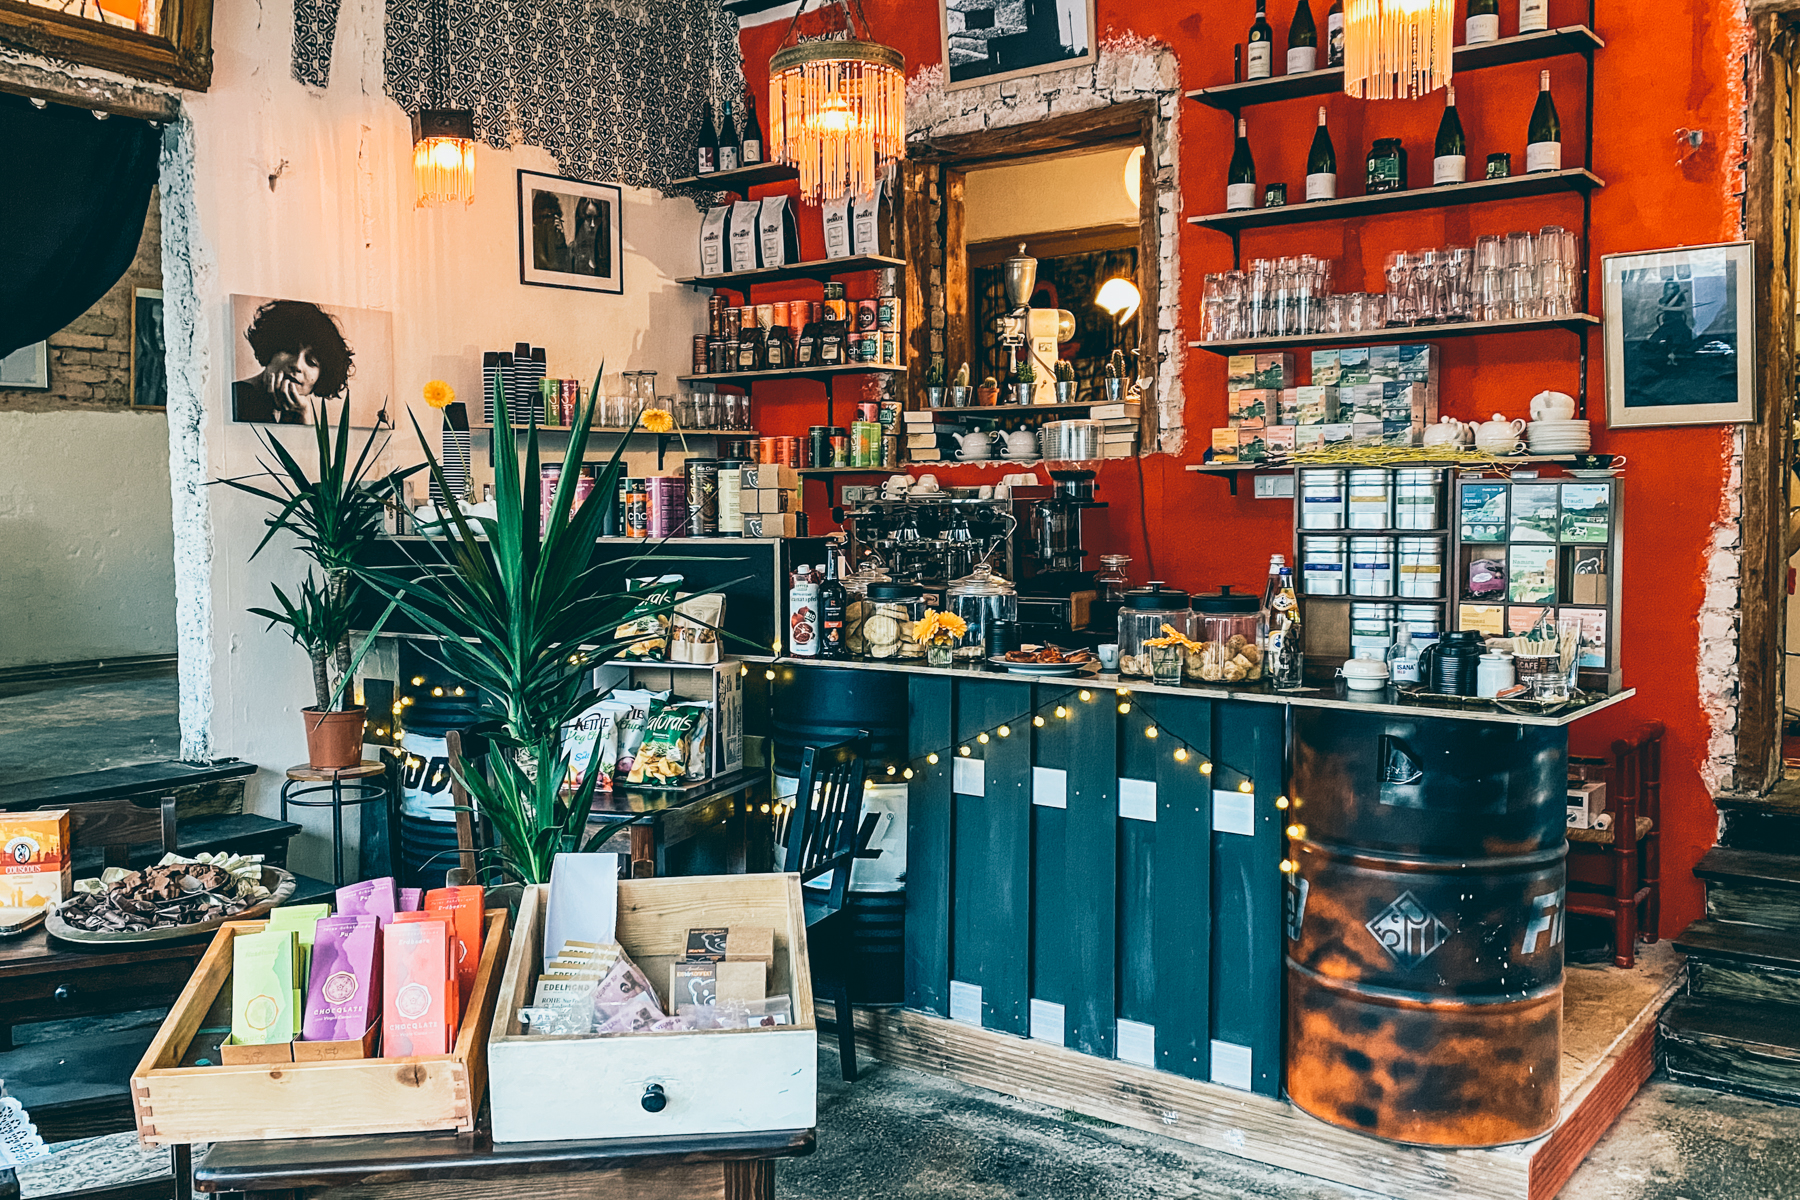 Geheimtipp Muenchen Cafe Le Hygge 3 – ©wunderland media GmbH